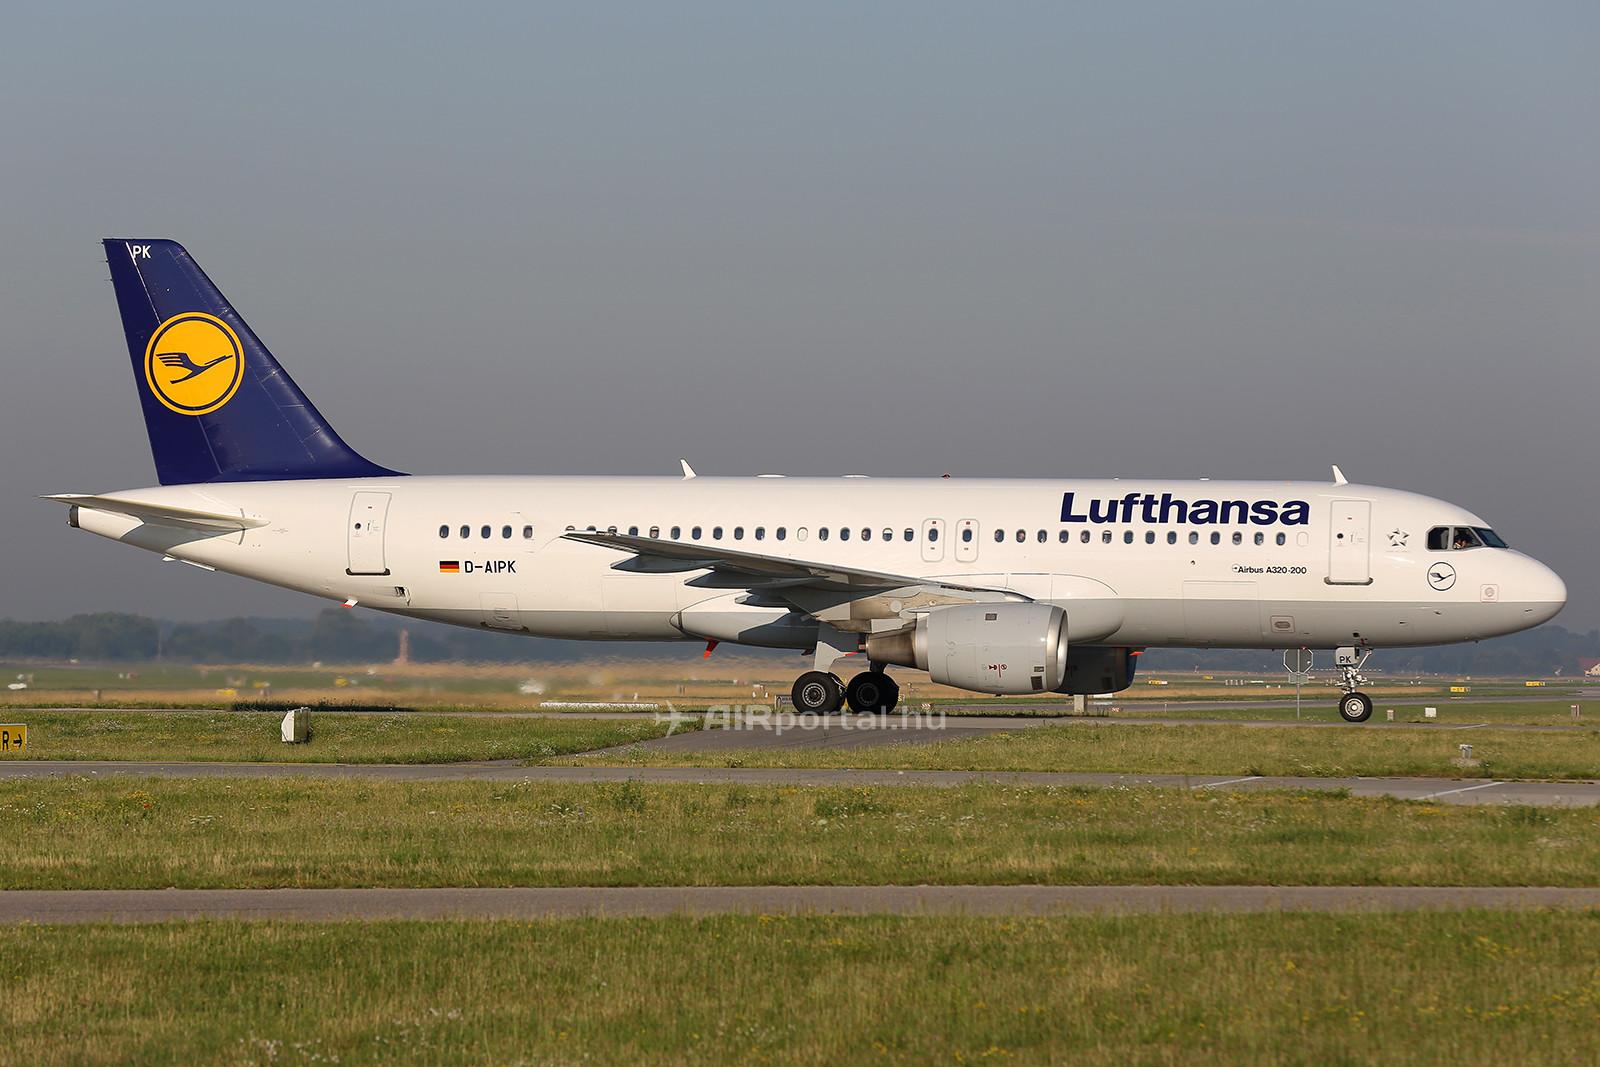 A Lufthansa egyik Airbus A320-200-asa Münchenben. (Fotó: AIRportal.hu)   © AIRportal.hu